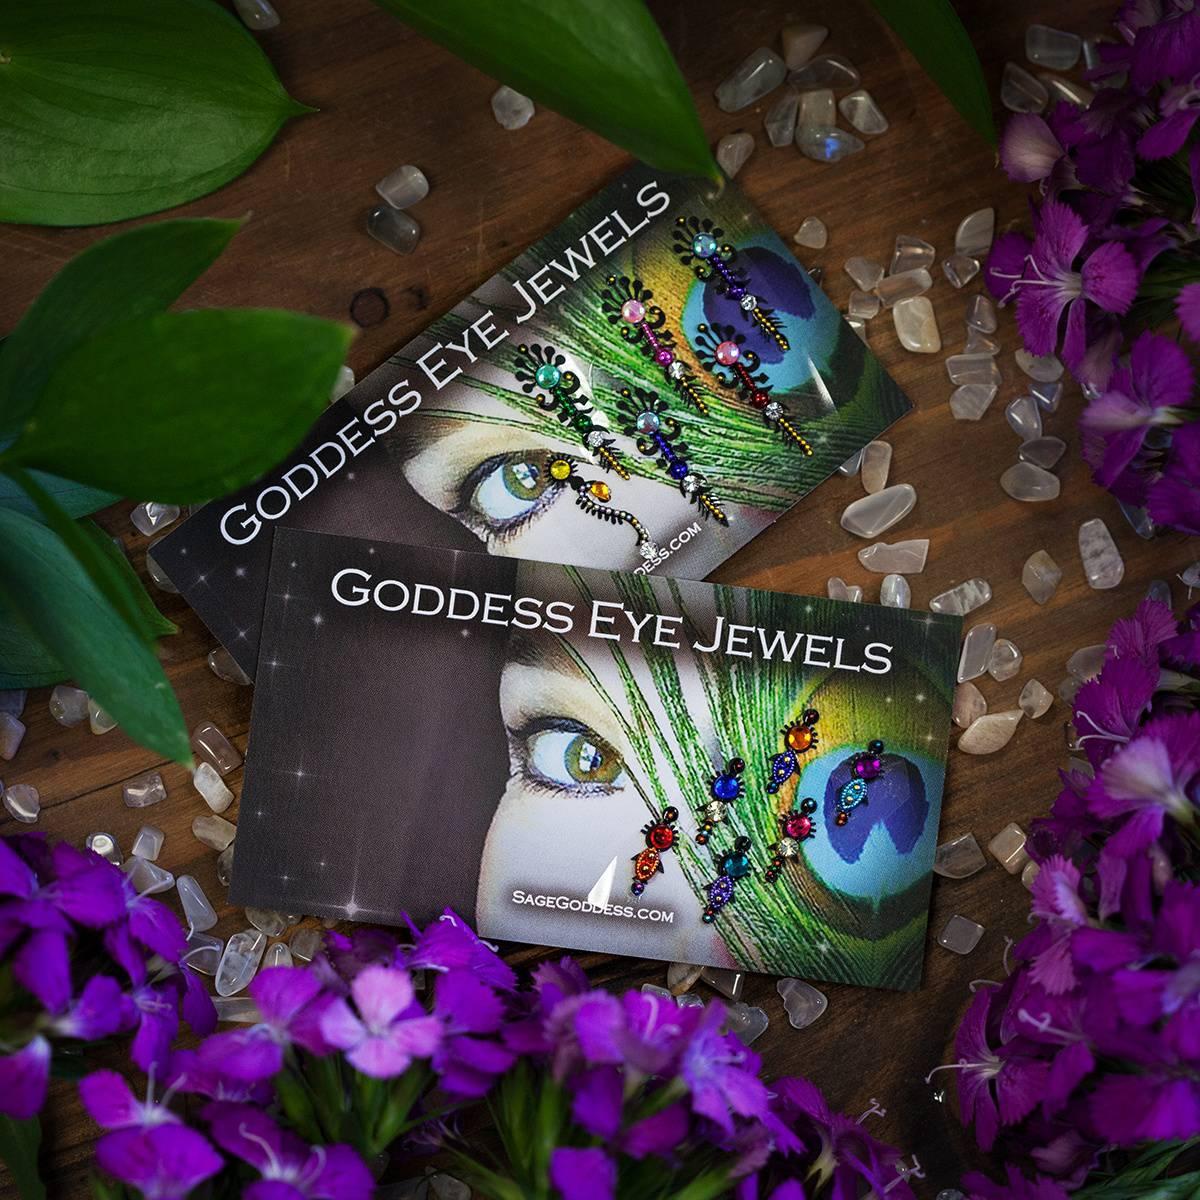 Goddess Eye Jewels 6_25 third